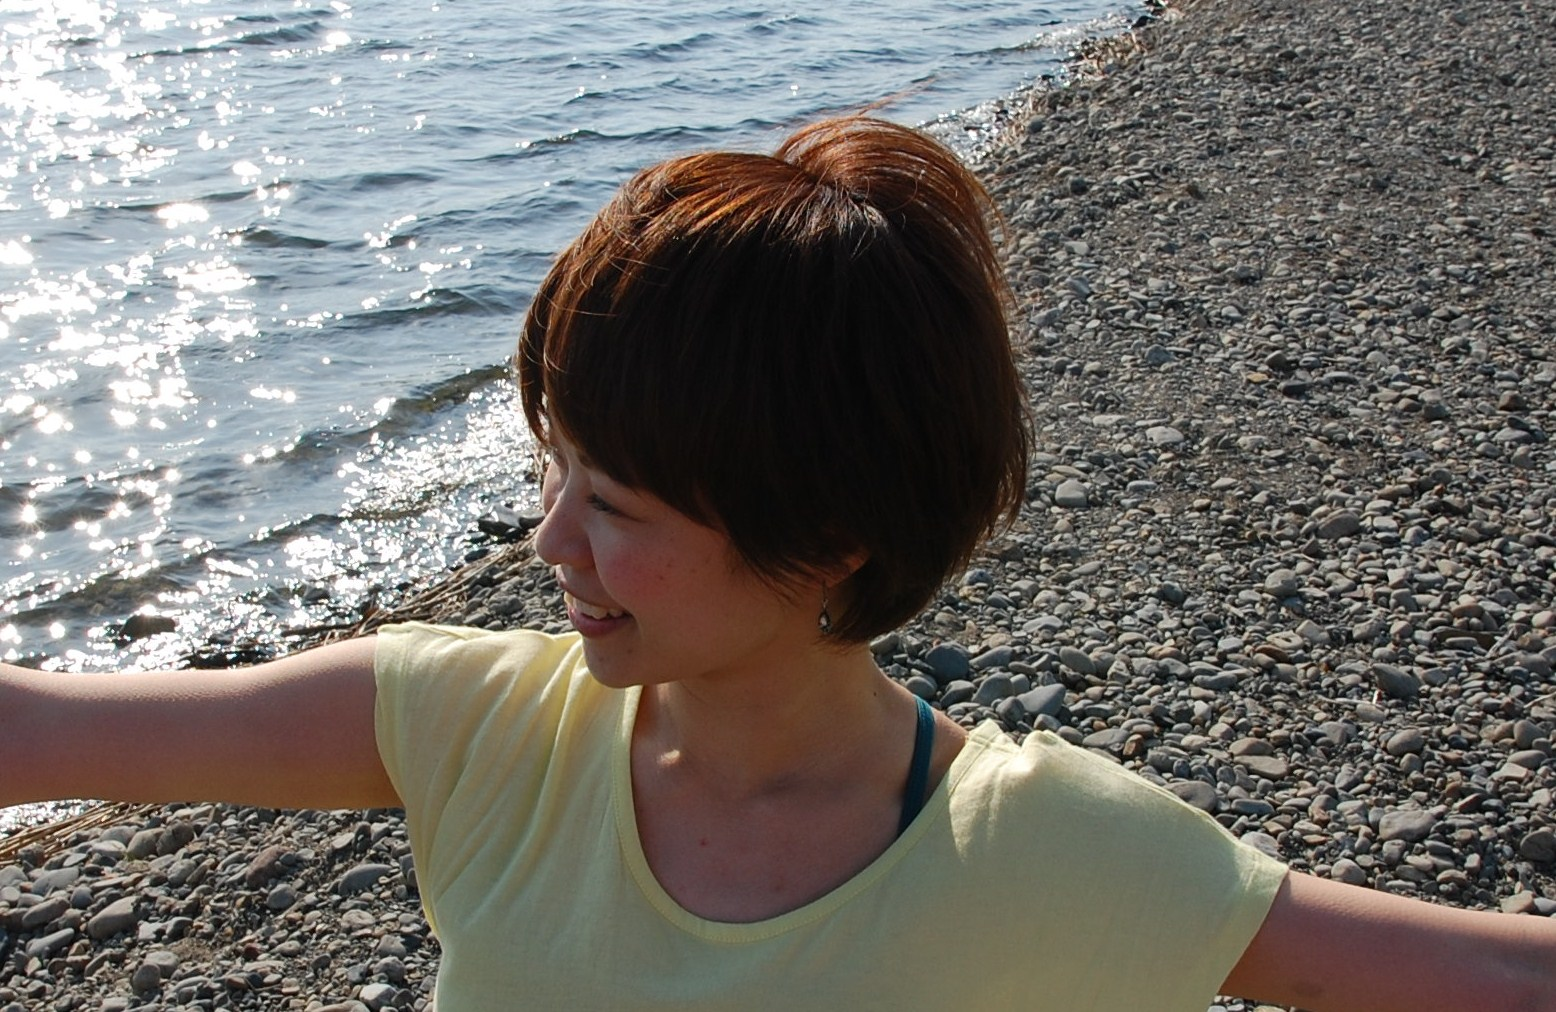 AGNIYOGA 新中野店 - 村木美貴(ムラキミキ)さんの写真